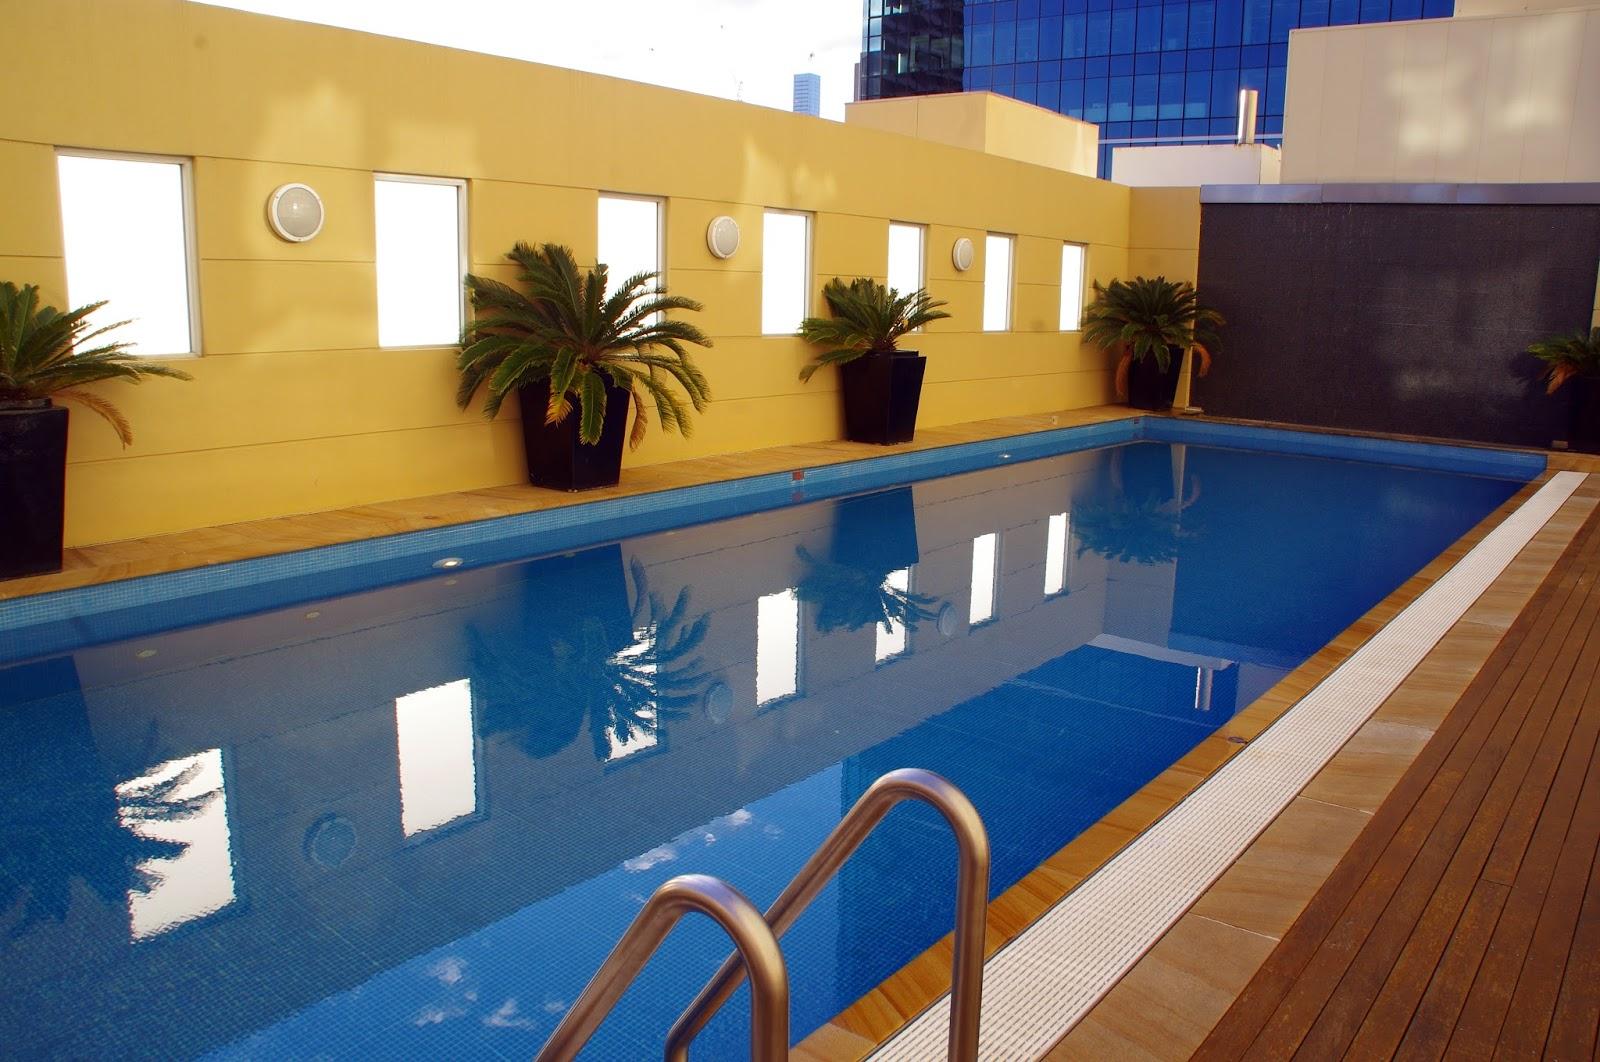 Swimming pool at swissotel sydney